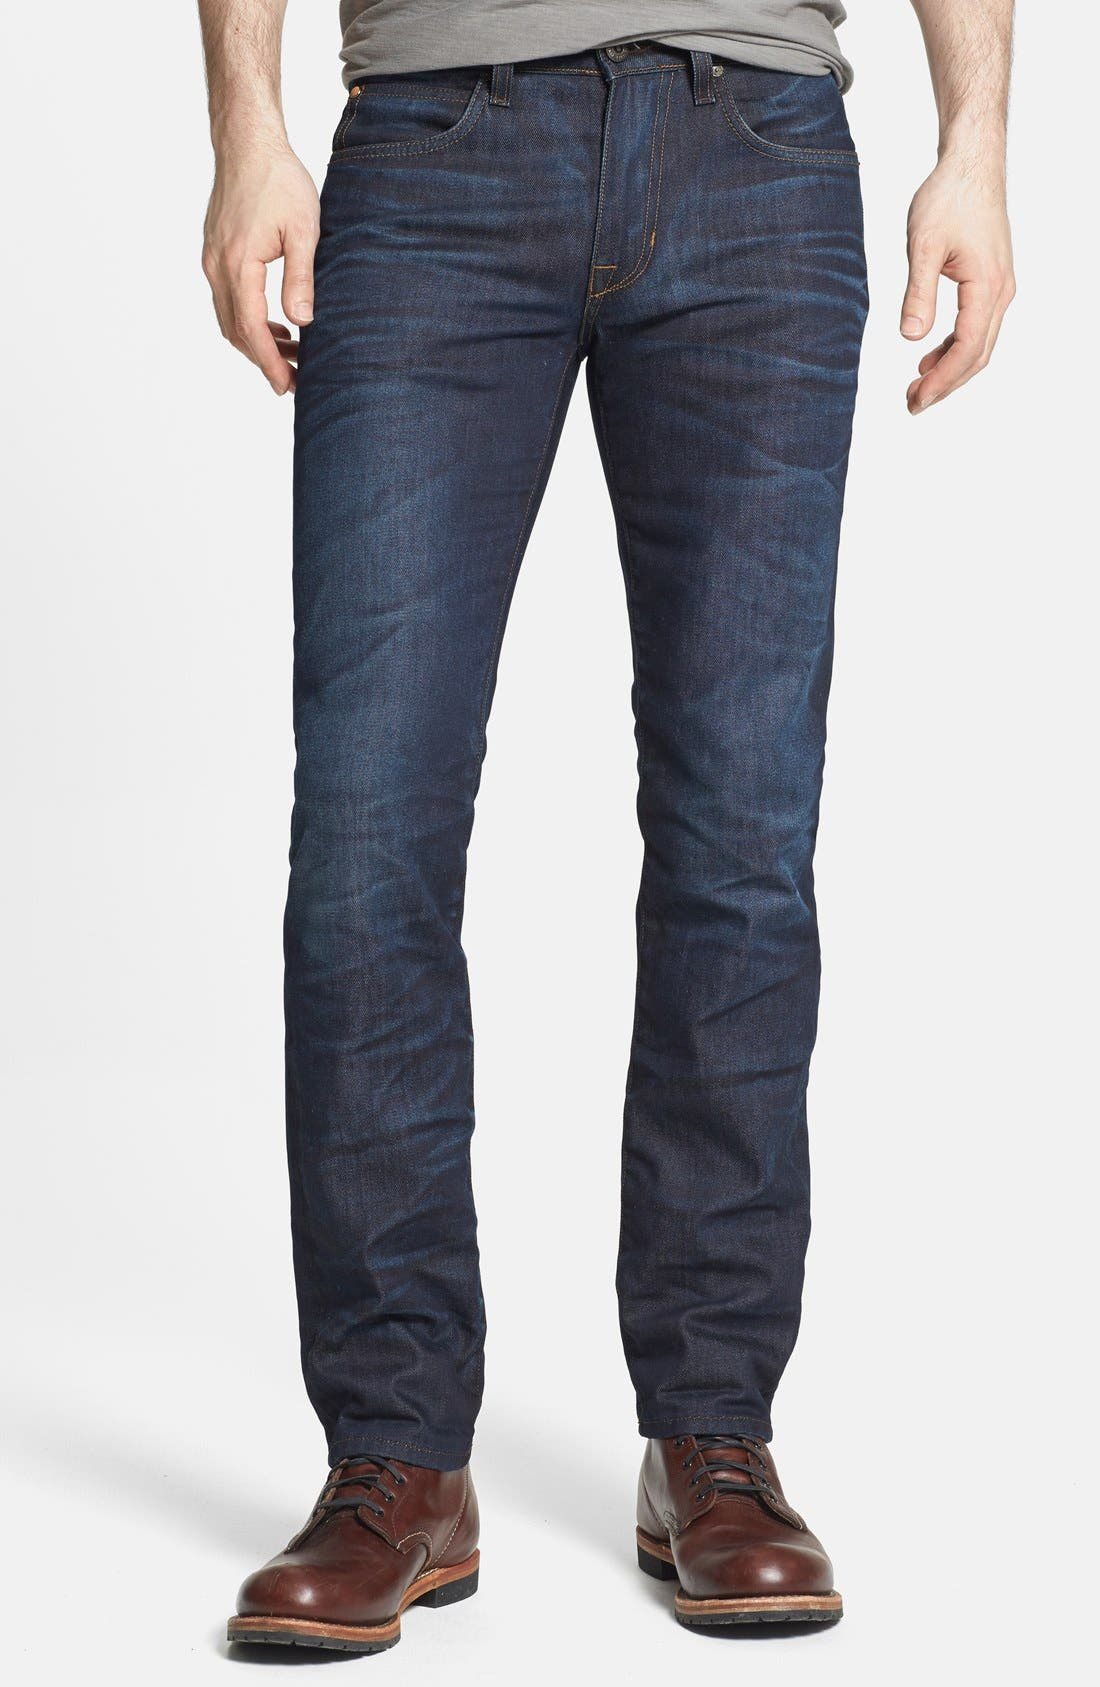 Alternate Image 1 Selected - Joe's 'Slim' Skinny Fit Jeans (Andres)